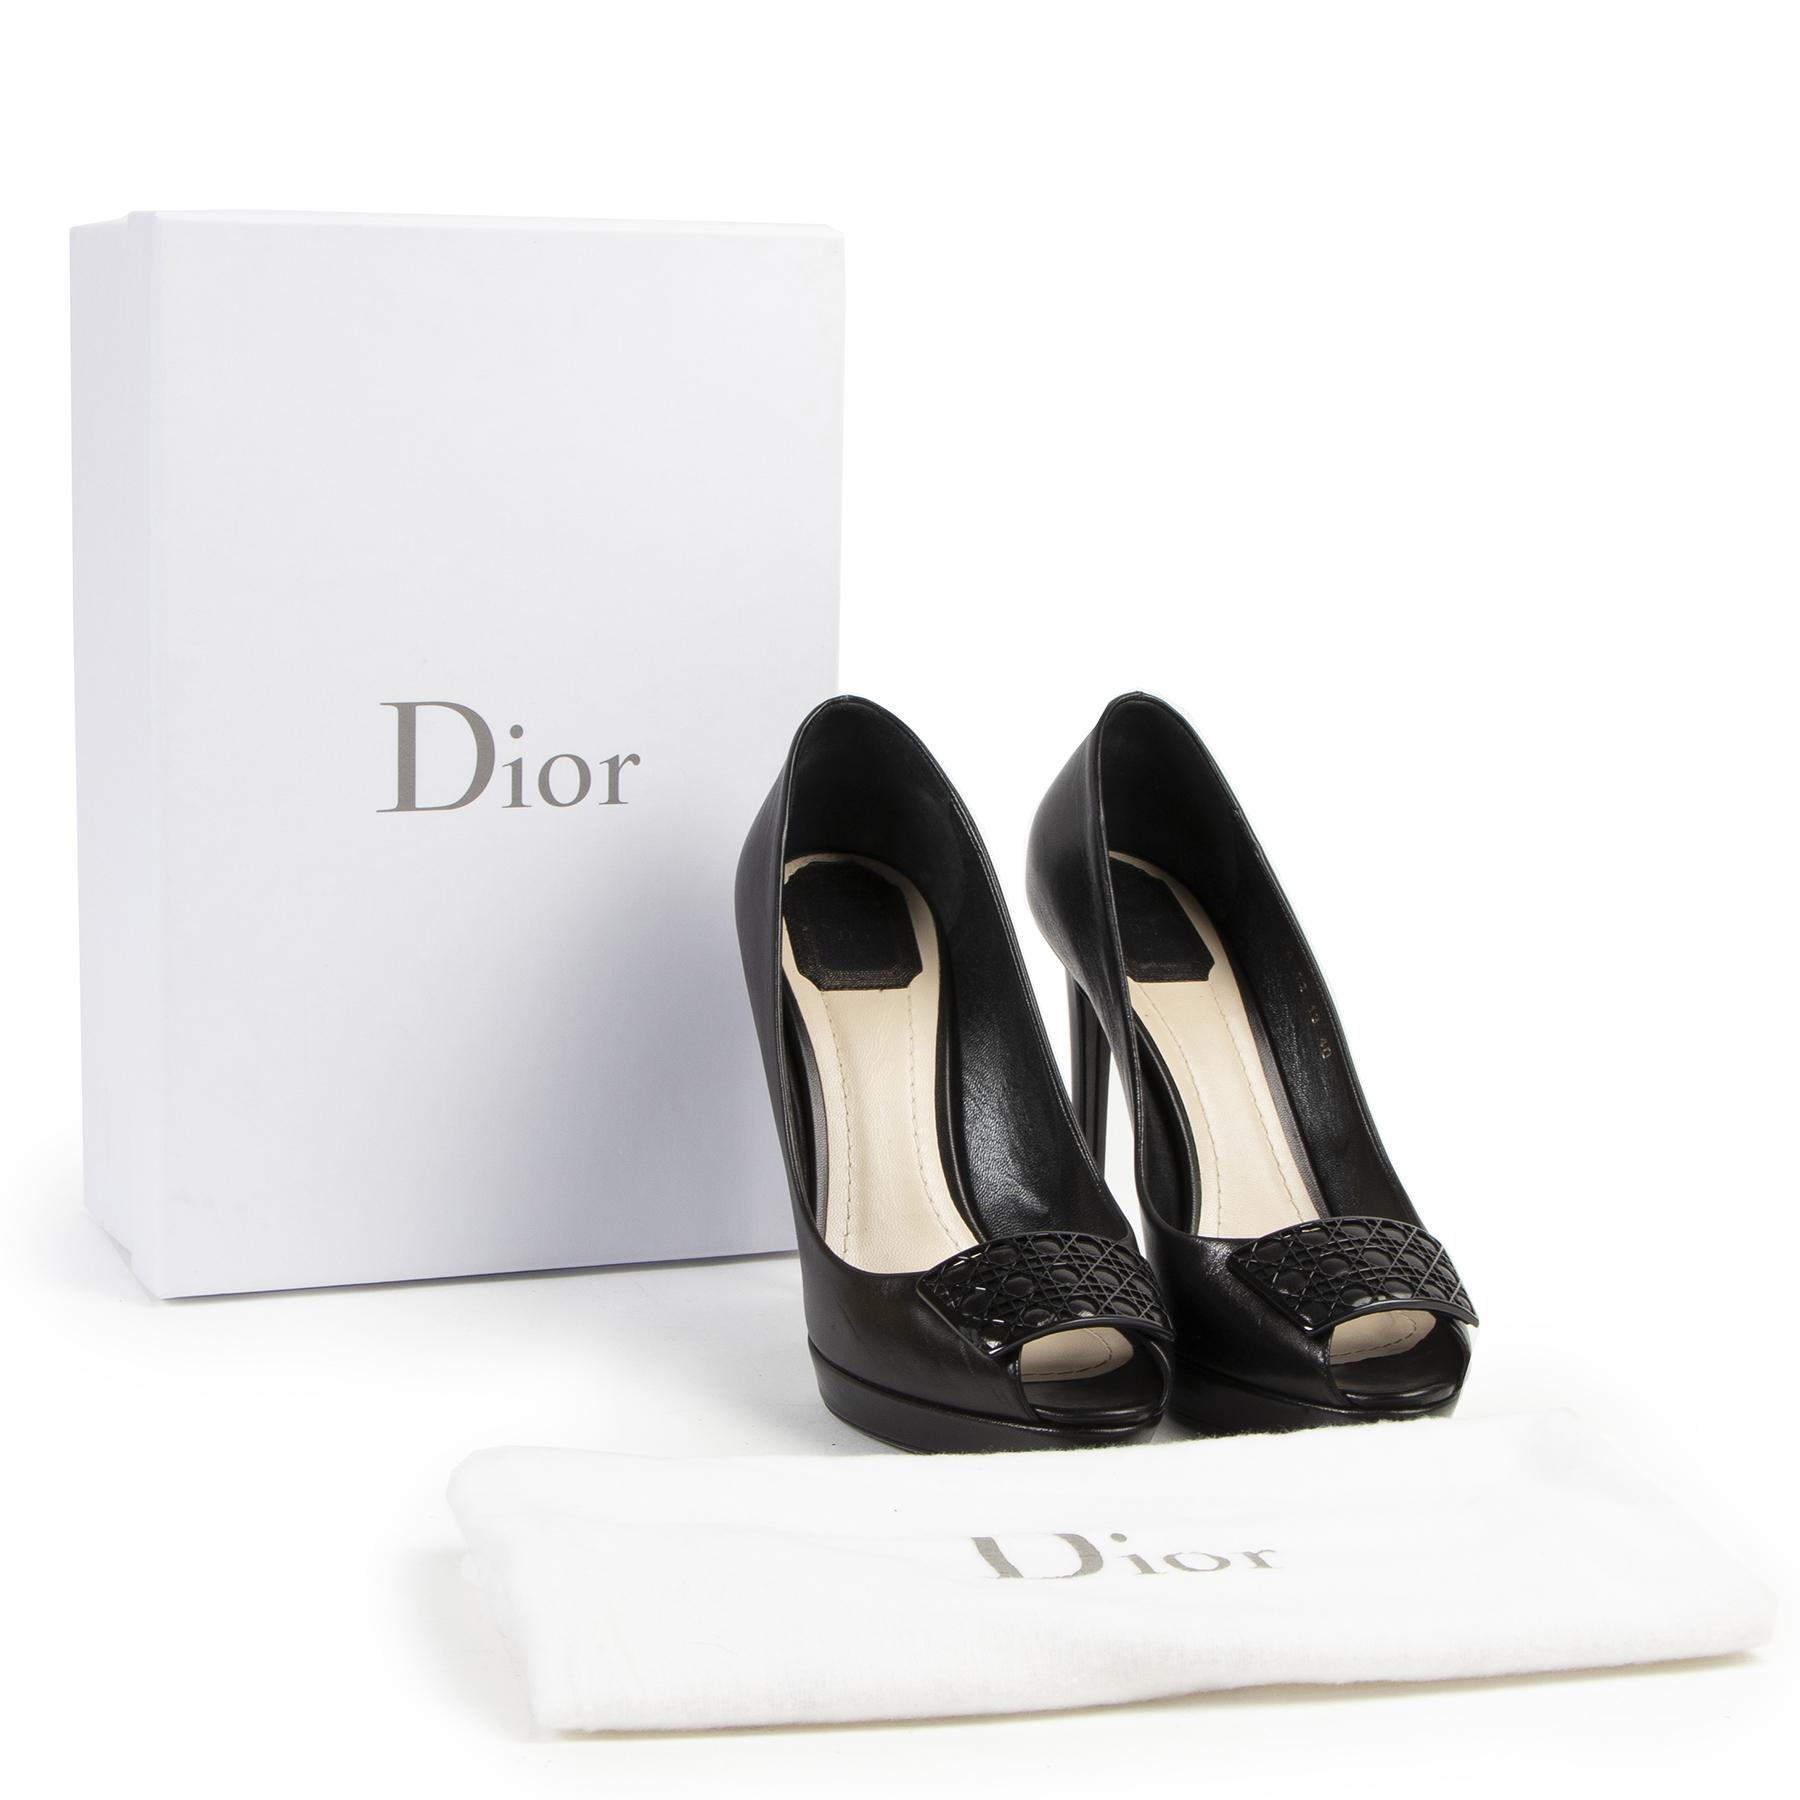 Dior Black Cannage Plaque Peeptoe Pumps - Size 40